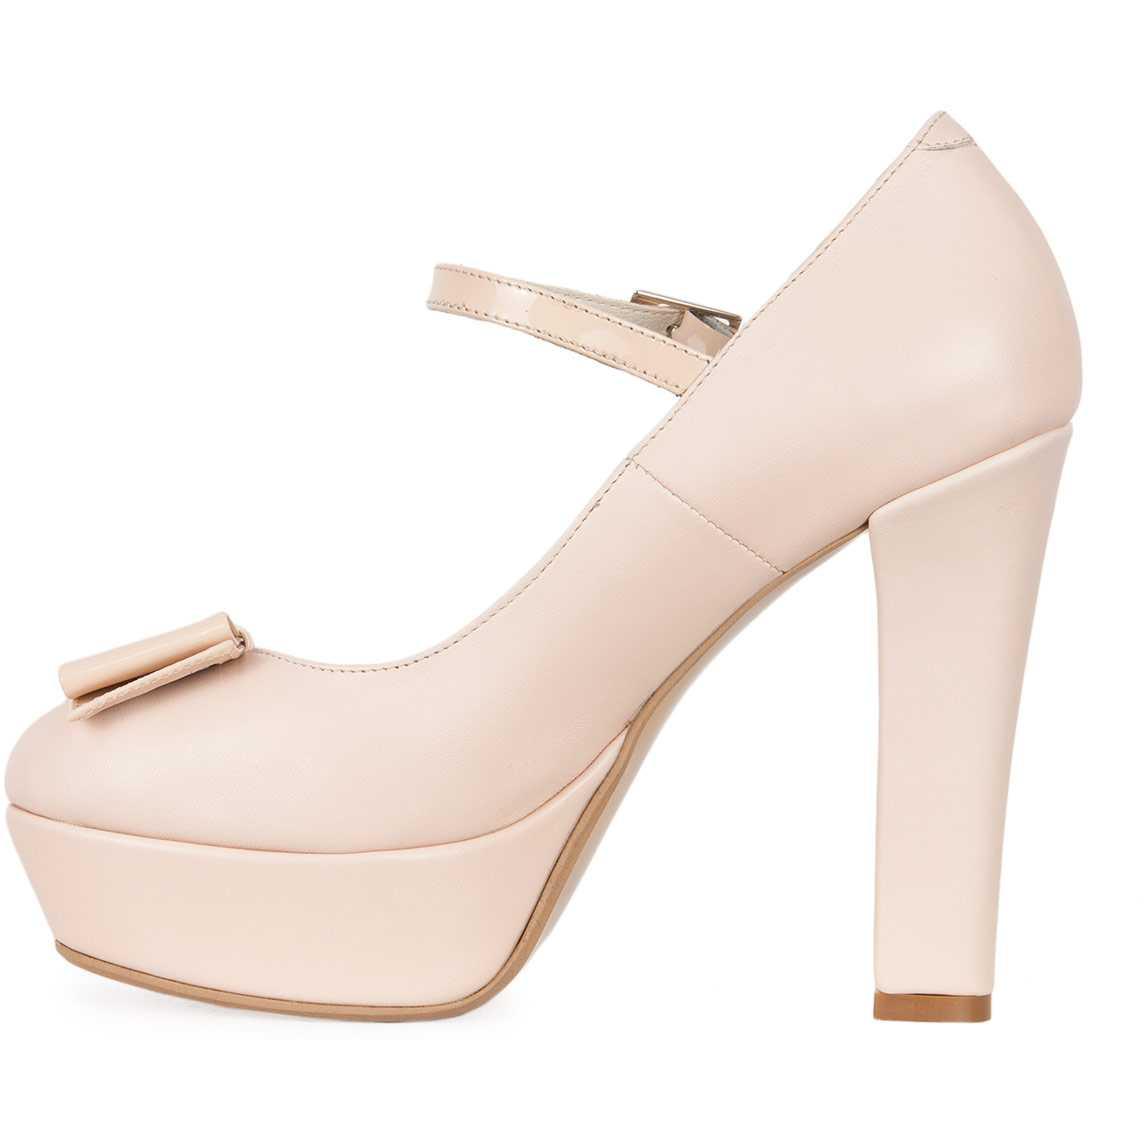 Pantofi bej cu toc inalt din piele naturala model PP-2308